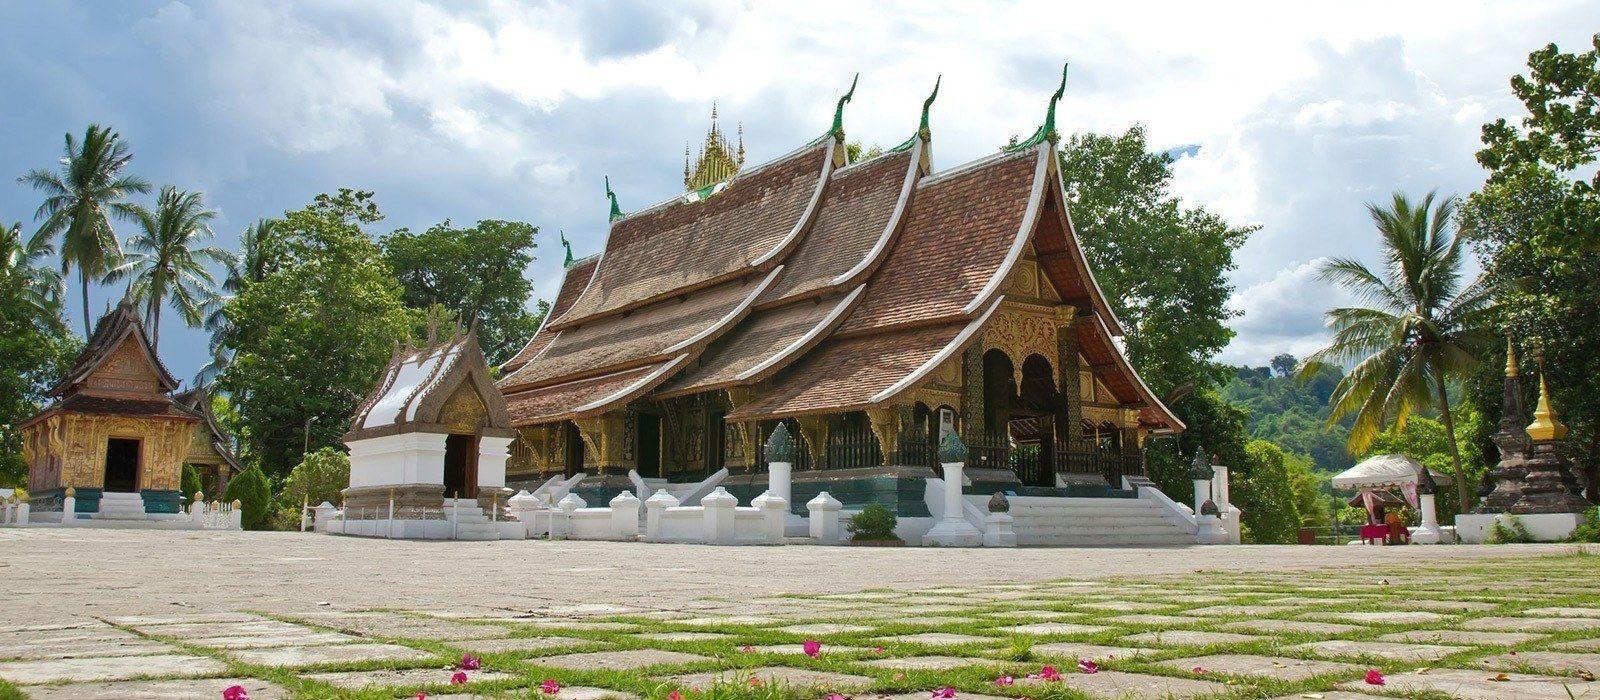 Ancient Wonders of Cambodia & Laos Tour Trip 5